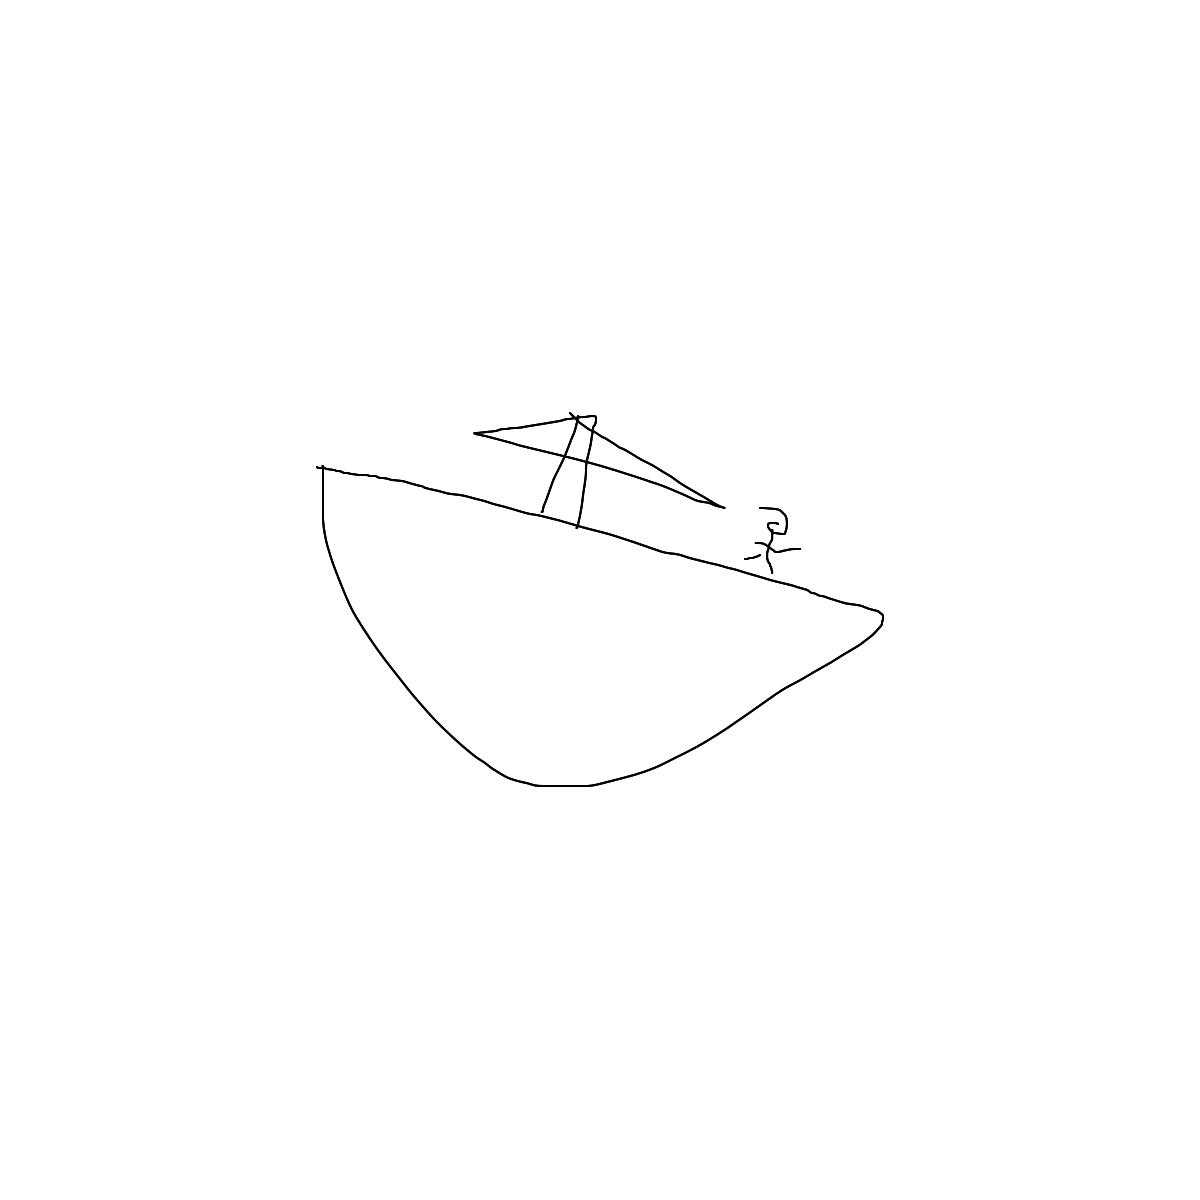 BAAAM drawing#6963 lat:44.6786460876464840lng: 13.4166469573974610